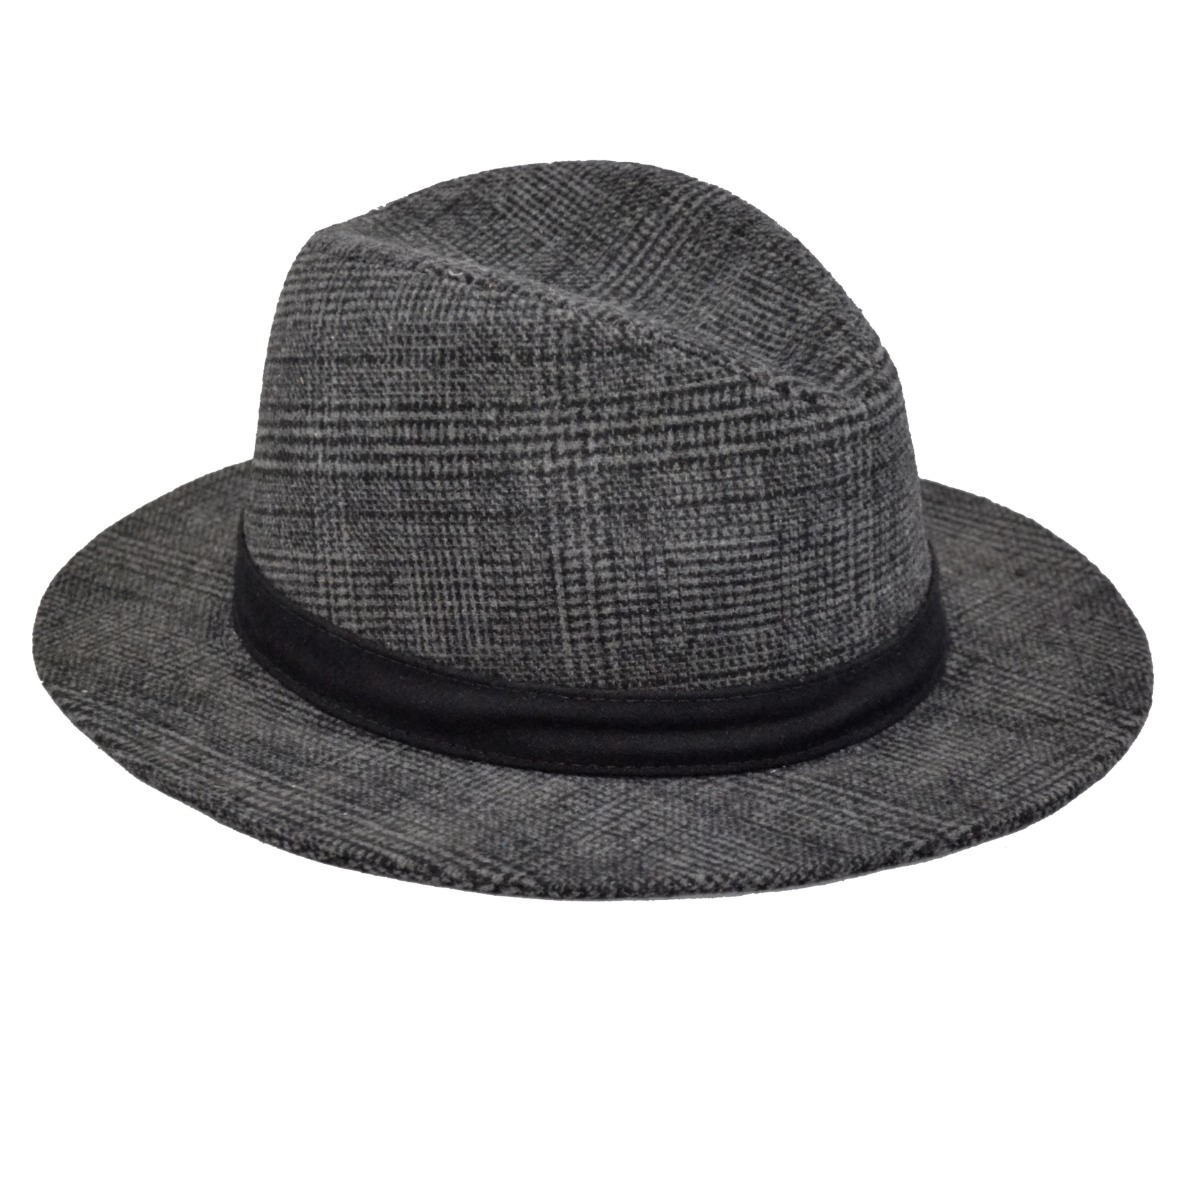 Sombrero Fedora Unisex Hipster Vintage Hombre Mujer -   550.00 en ... 2cee8865a2f